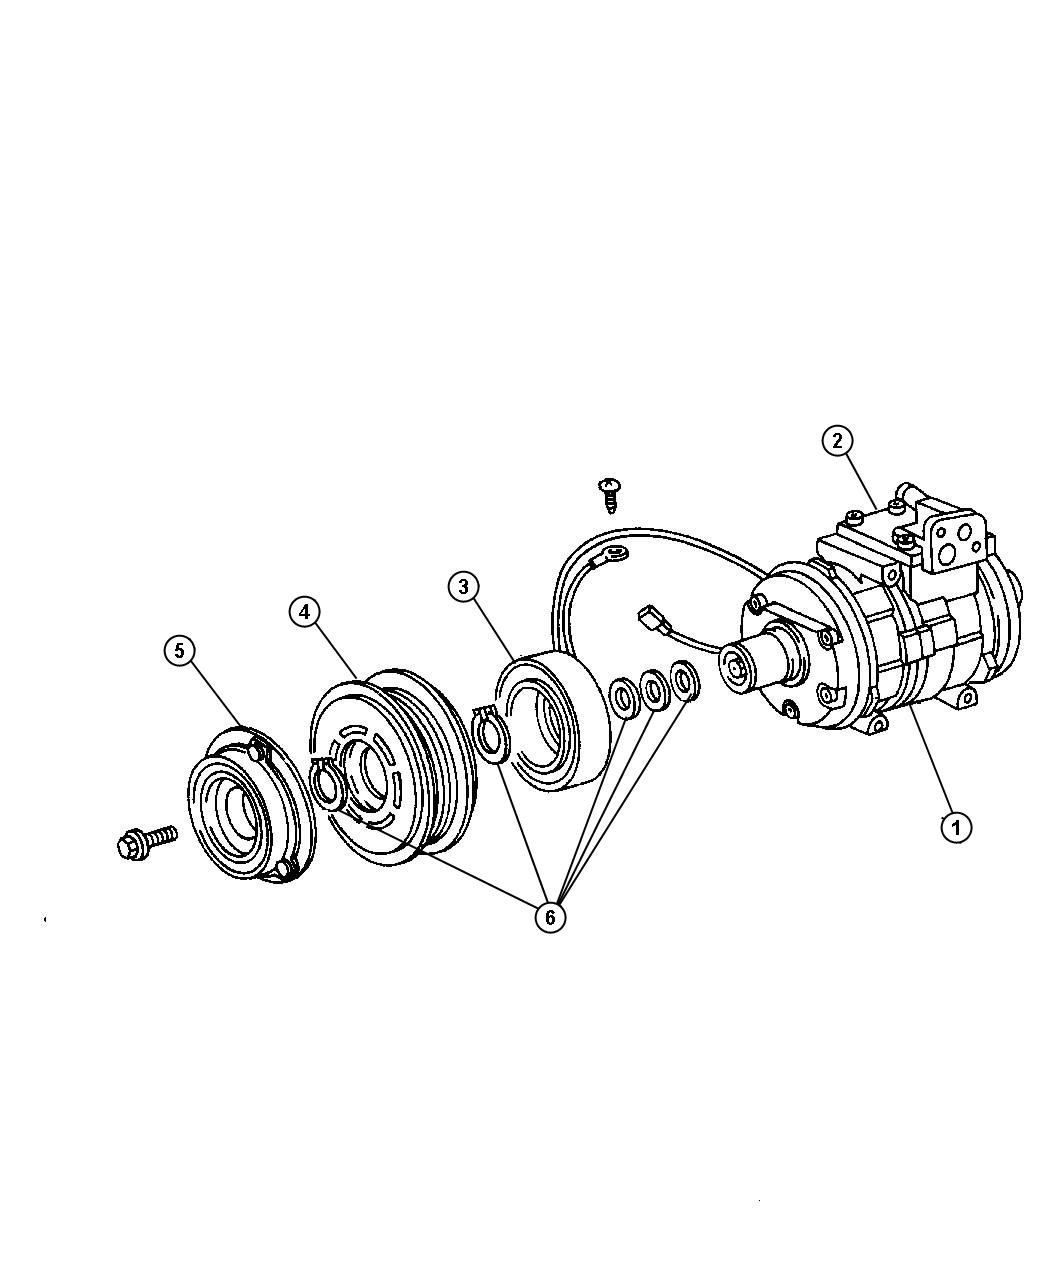 Jeep Wrangler Compressor Air Conditioning Export